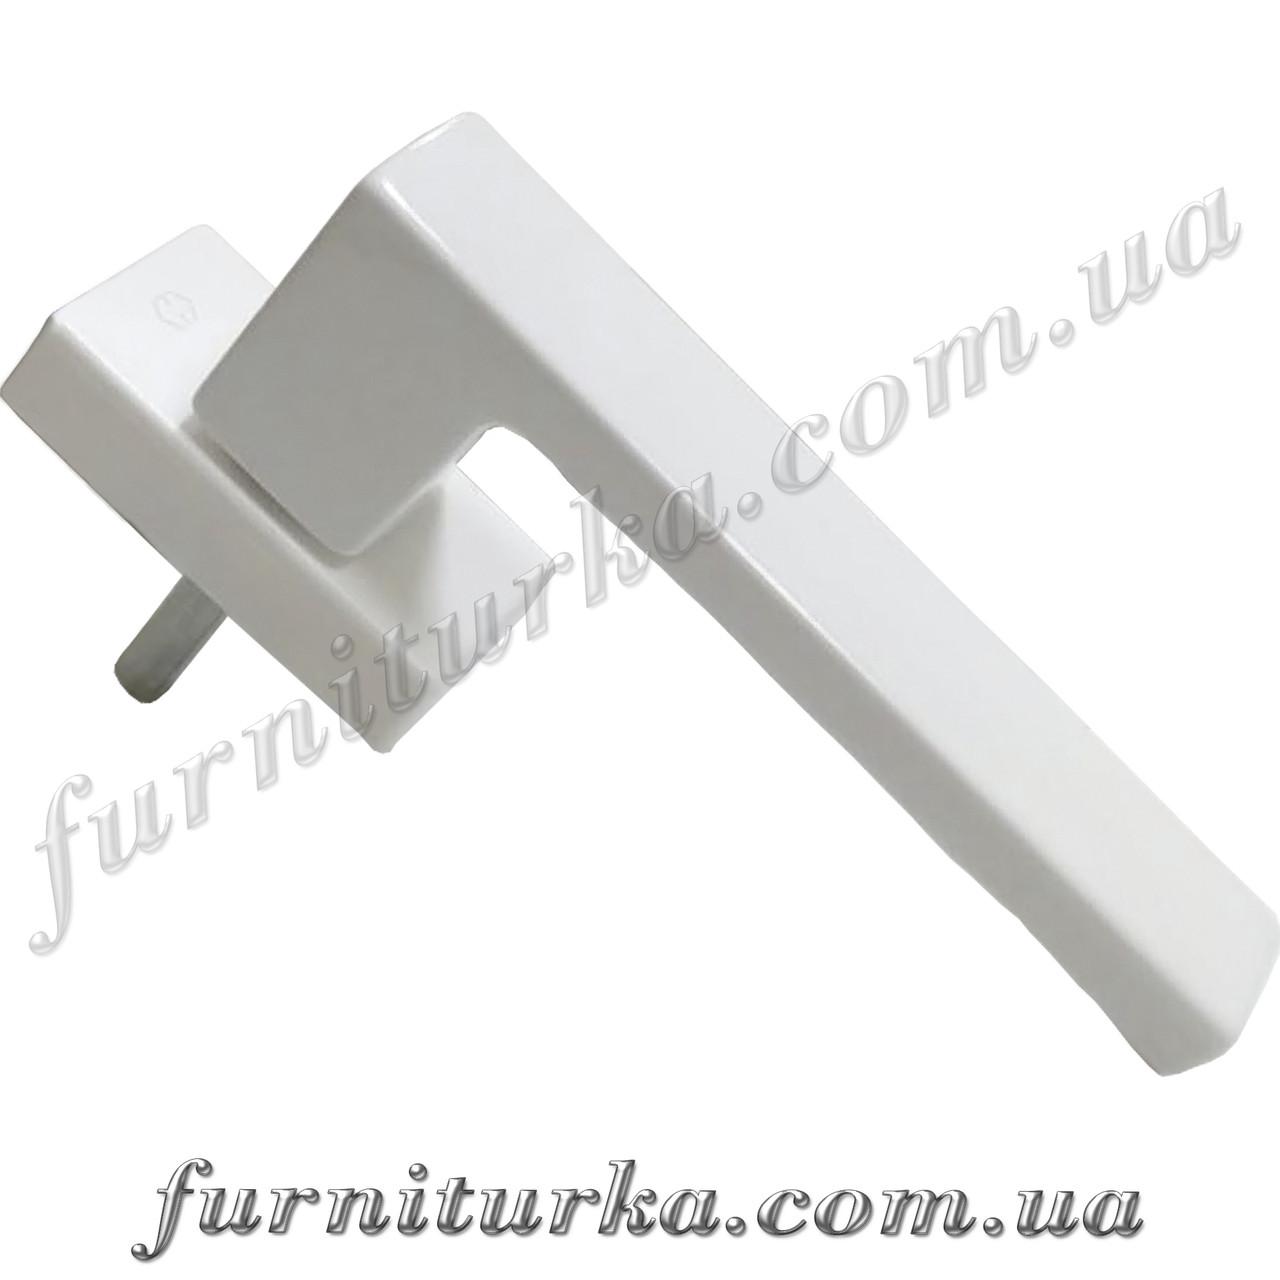 Ручка оконная Hoppe Toulon Secustik®, белая